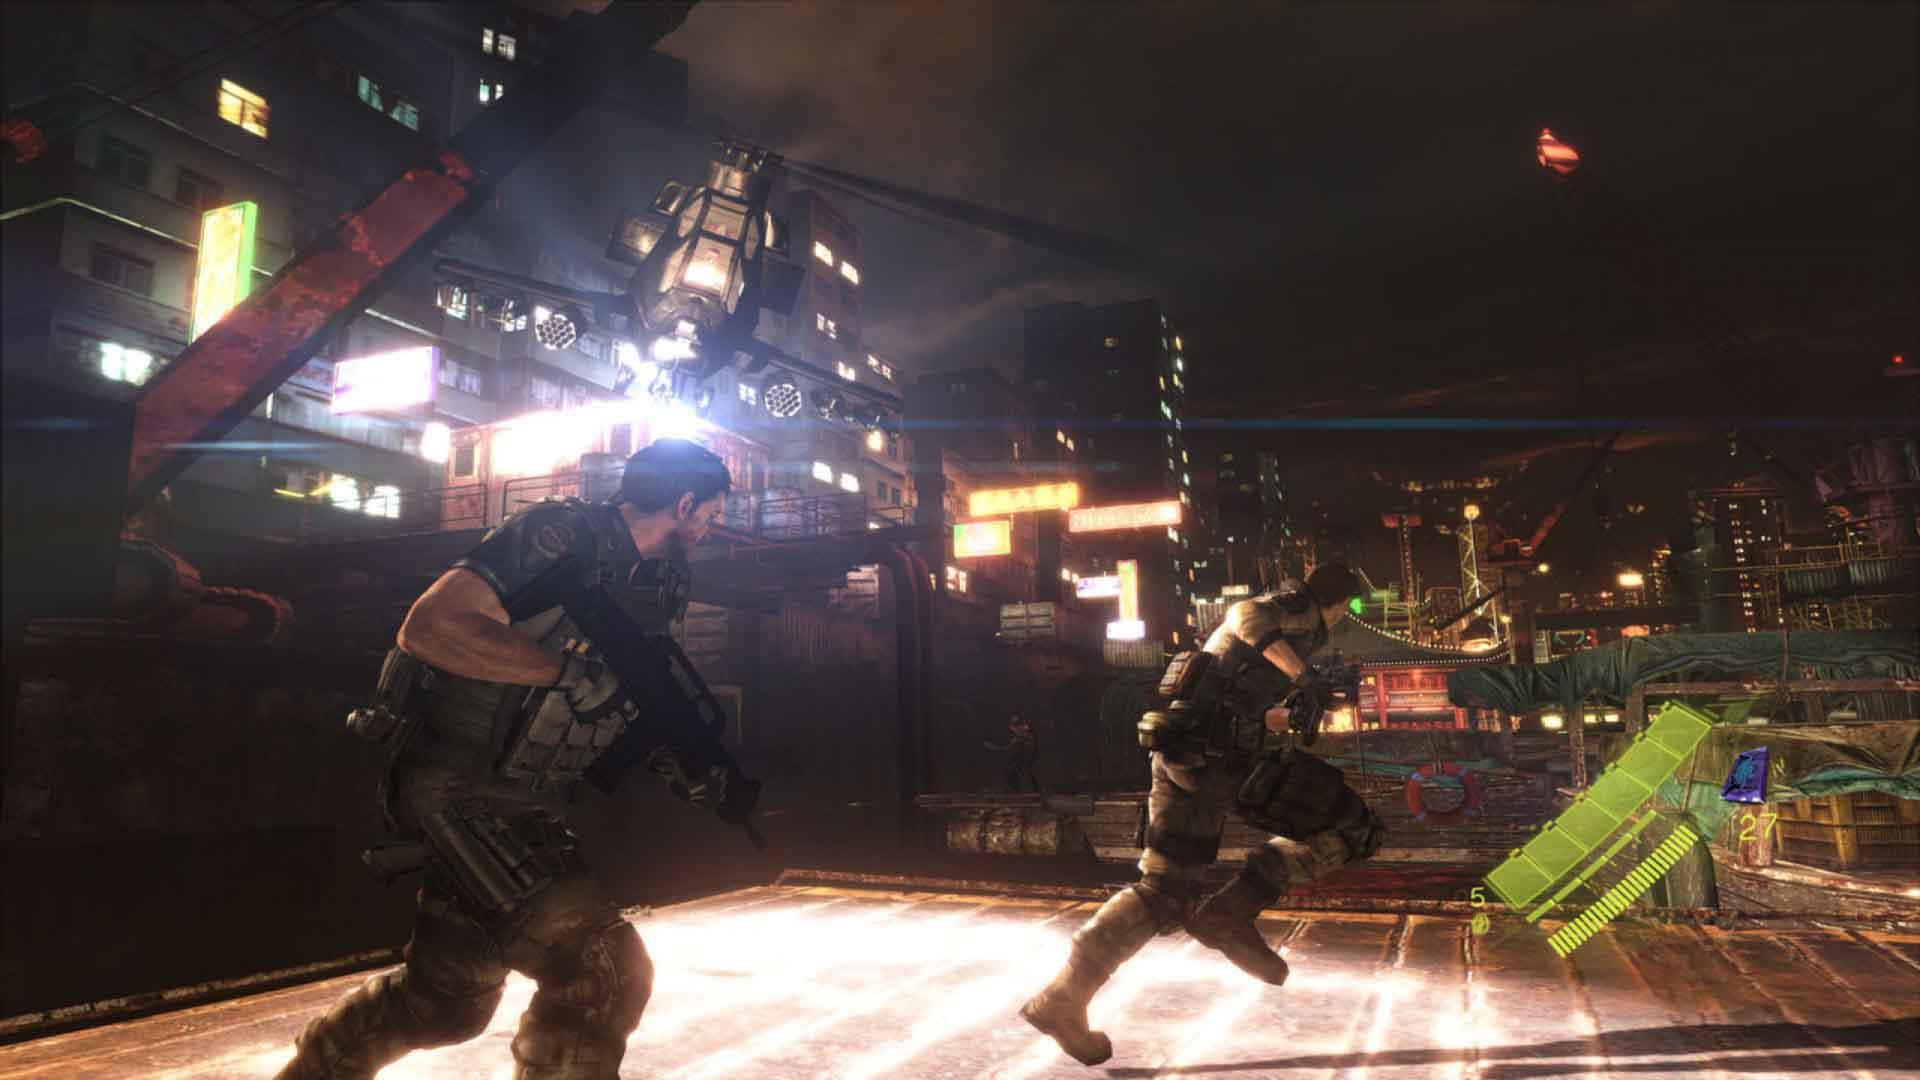 download-Resident-Evil-6-hadoan-tv-1